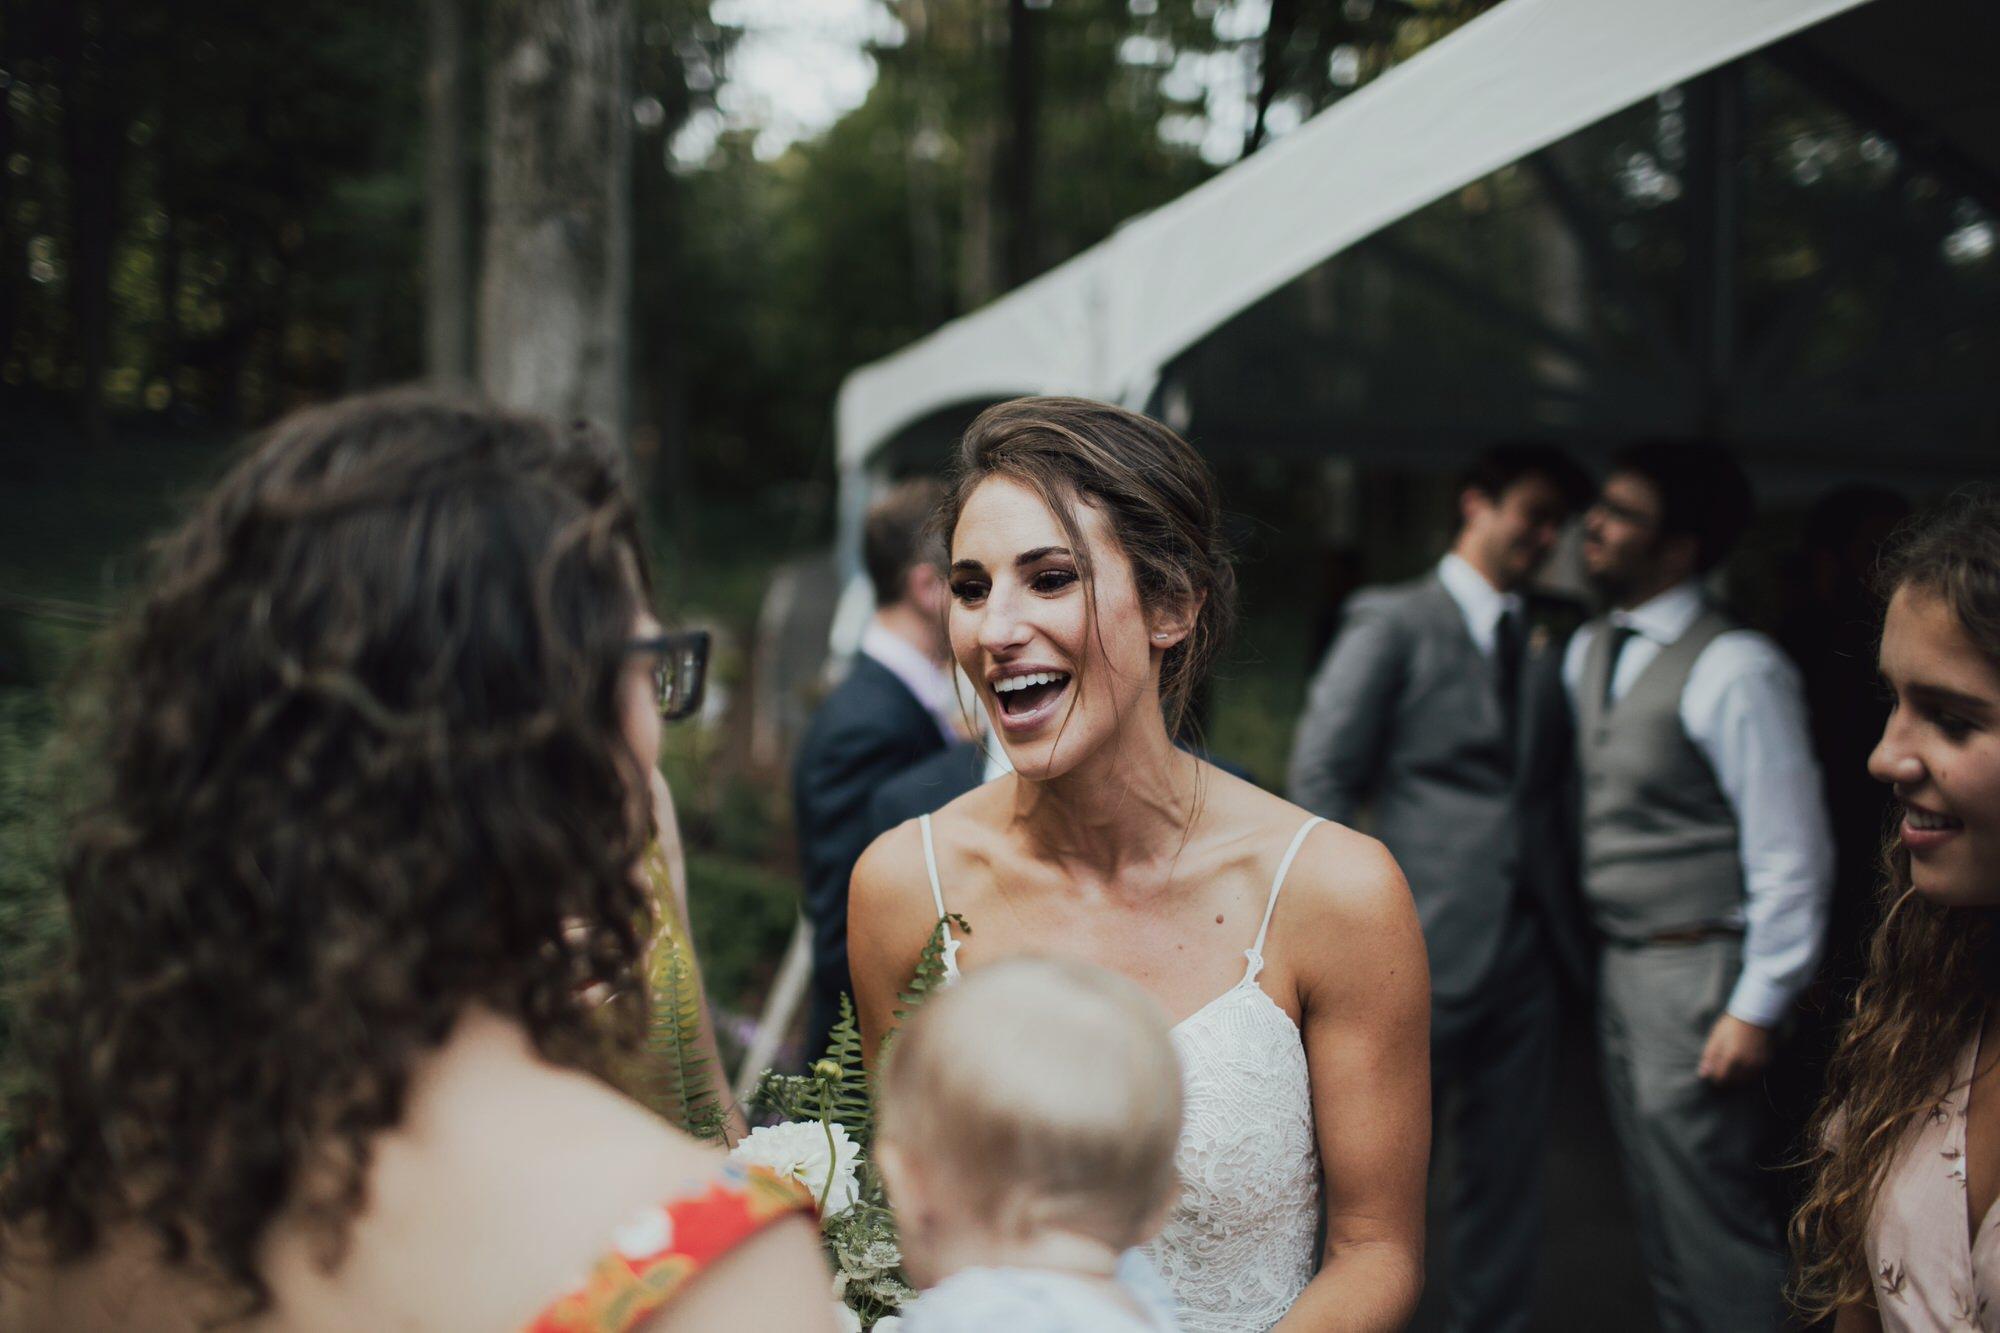 emily-aaron-rochester-new-york-wedding-photographer-84.JPG